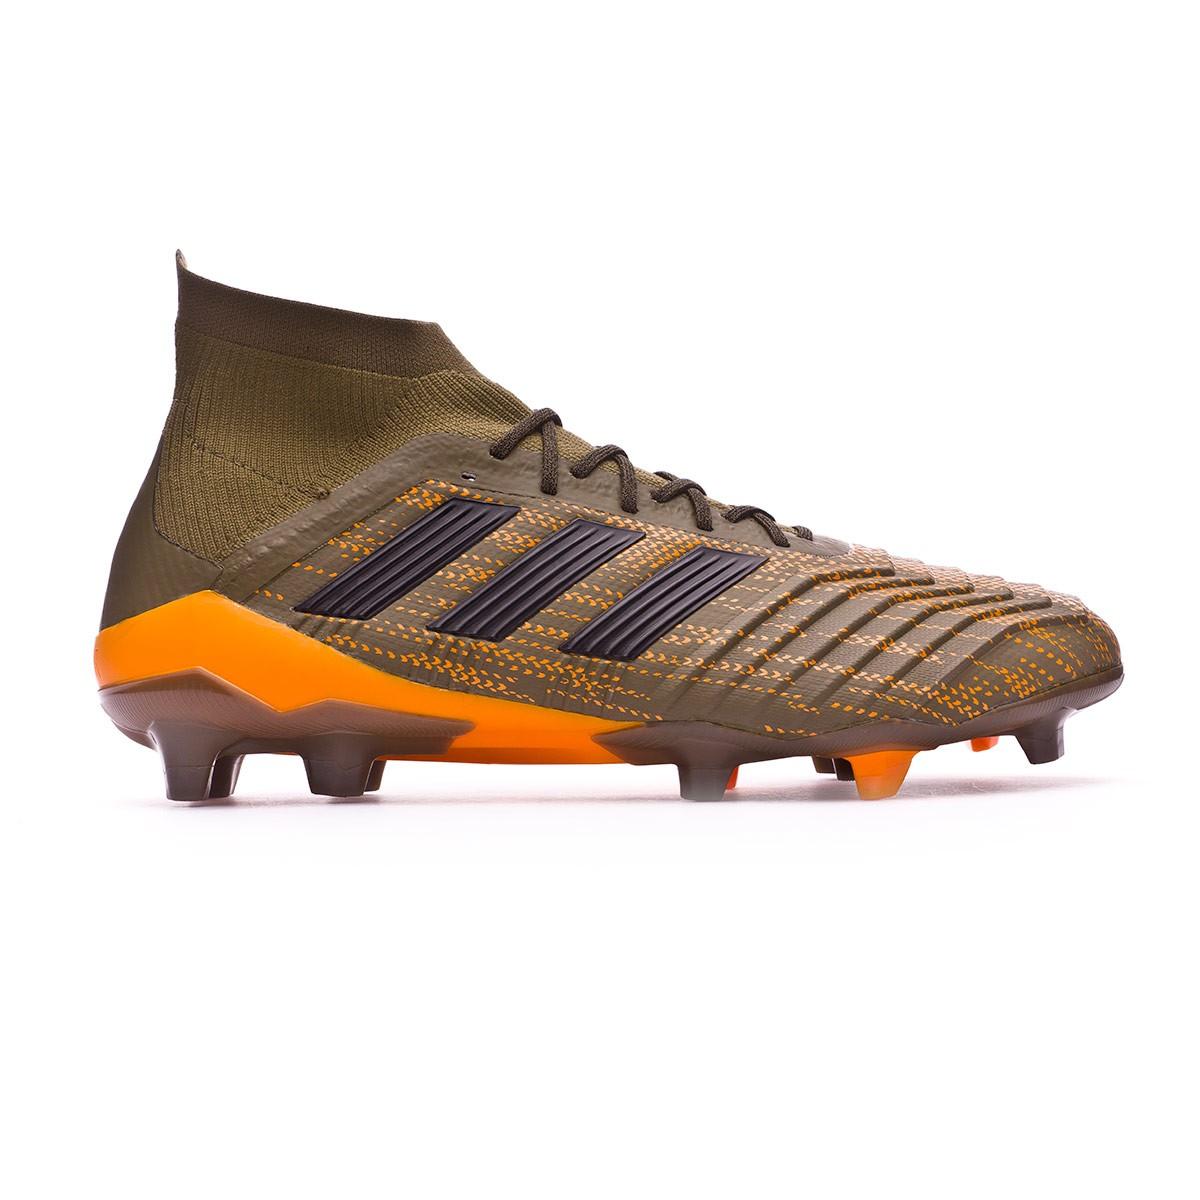 newest 5f260 0da21 ... best boot adidas predator 18.1 fg trace olive core black bright orange  4d3a0 ace63